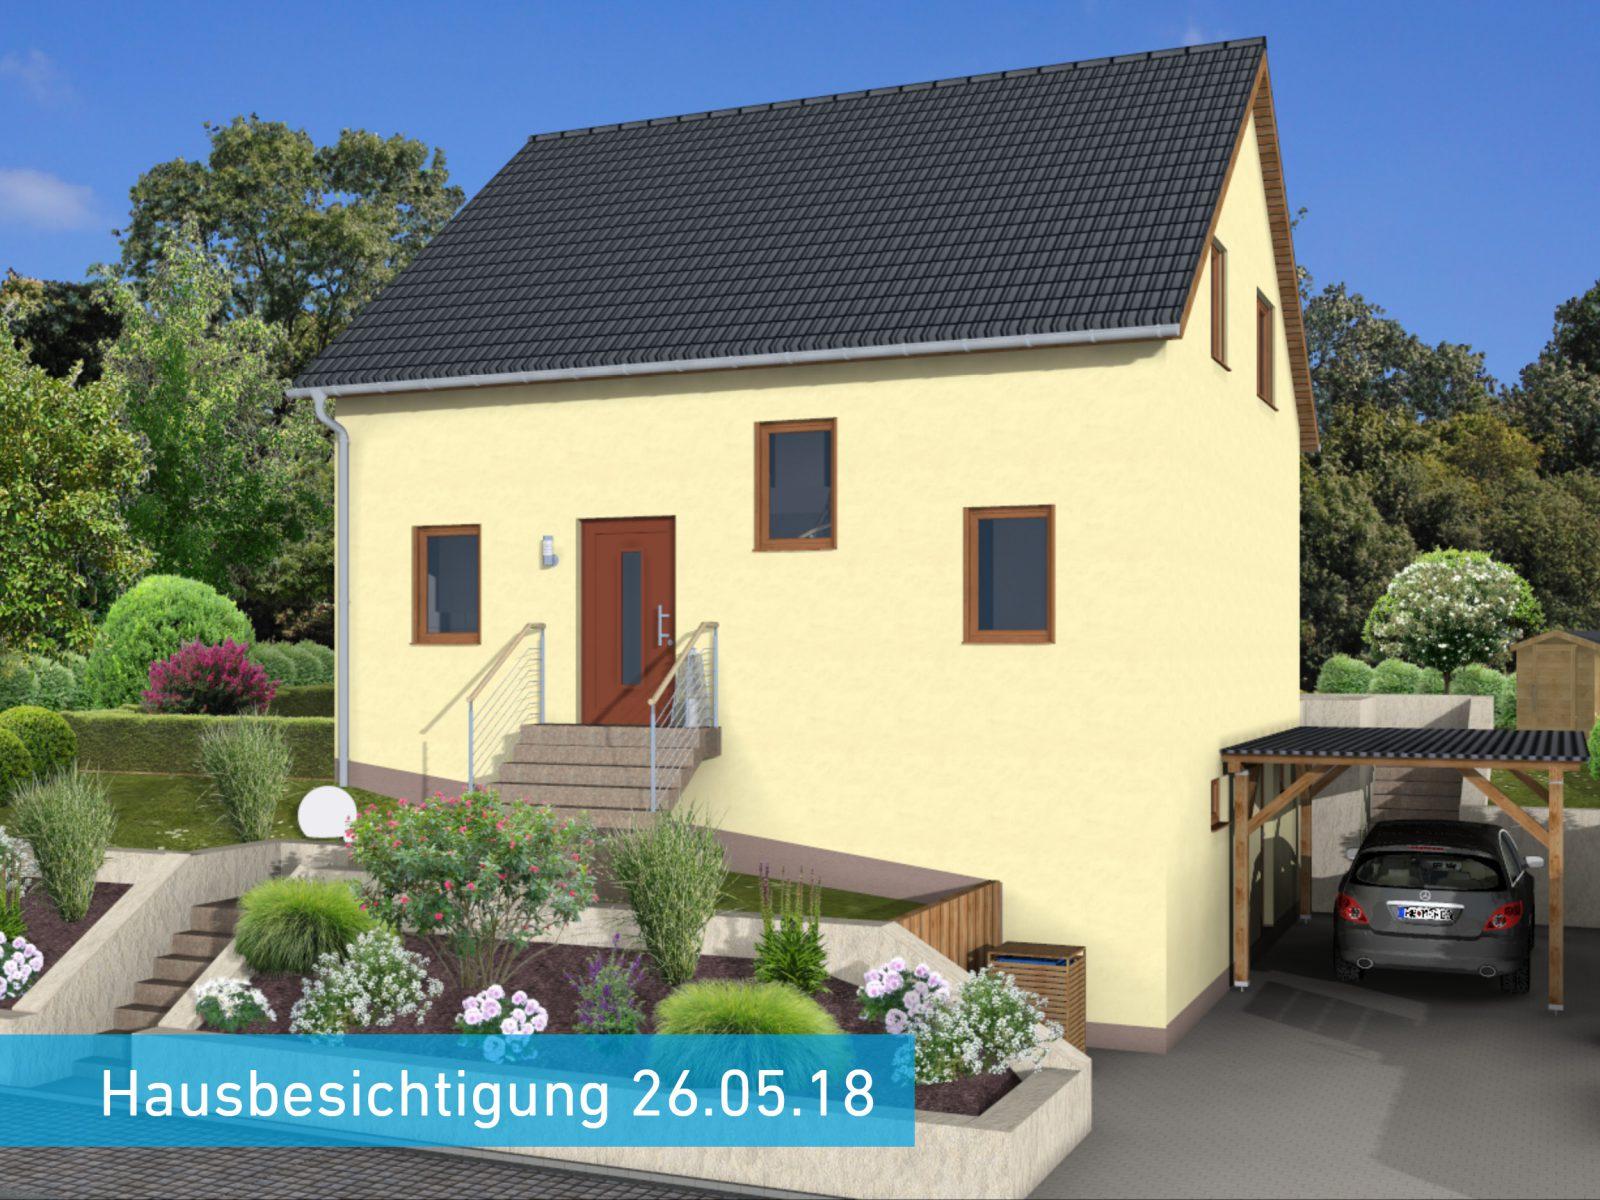 hausbesichtigung in wemmetsweiler individuell geplantes linea mit keller. Black Bedroom Furniture Sets. Home Design Ideas